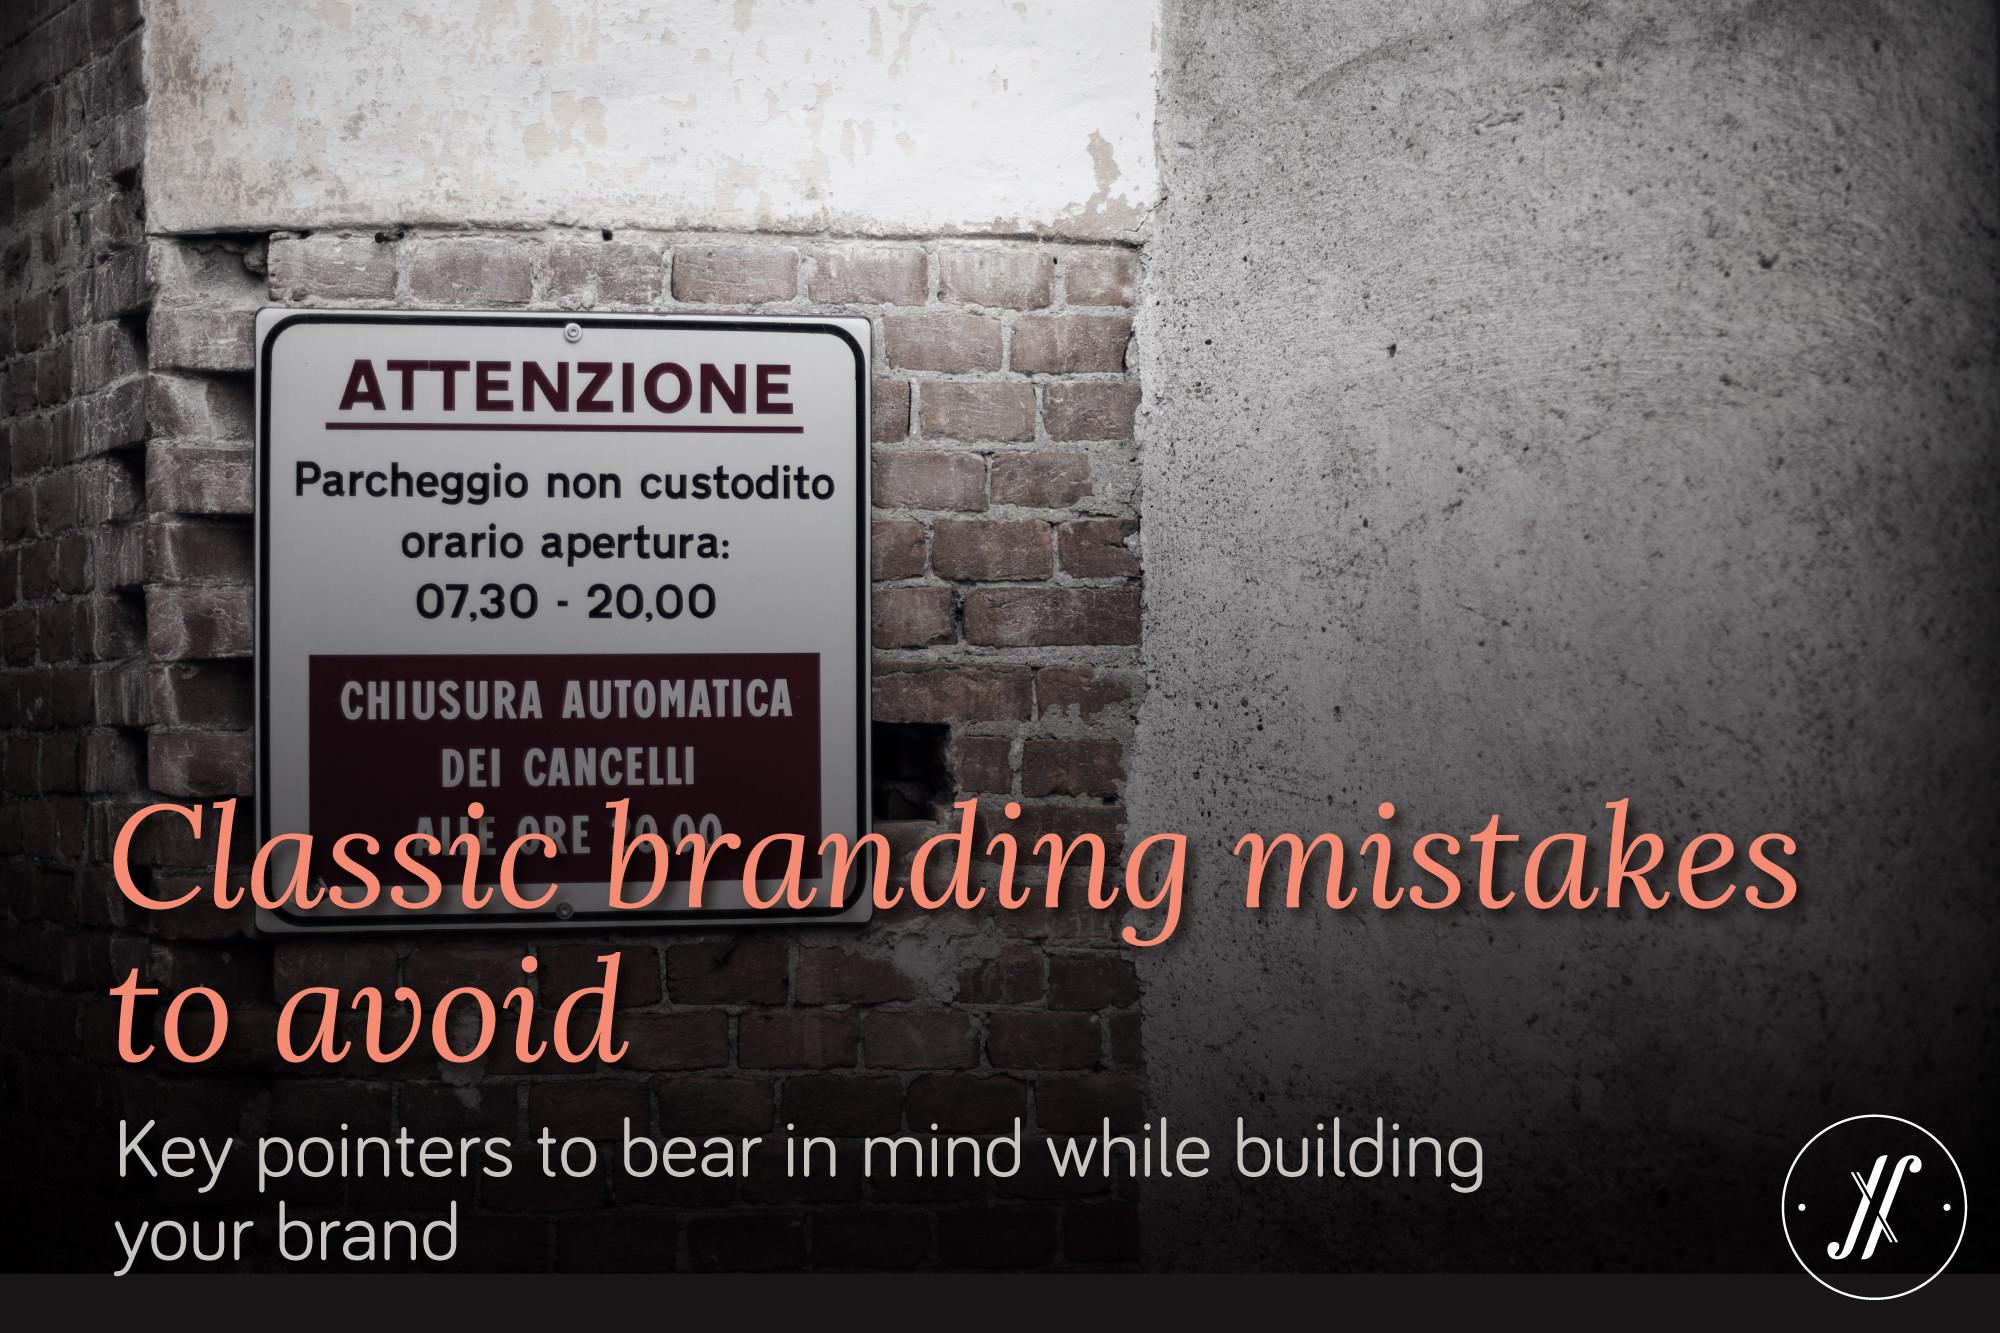 Yellow-Fishes-Branding-Strategy-and-brand-design-agency-Mumbai-Branding-mistakes-to-avoid-Header-image.jpg